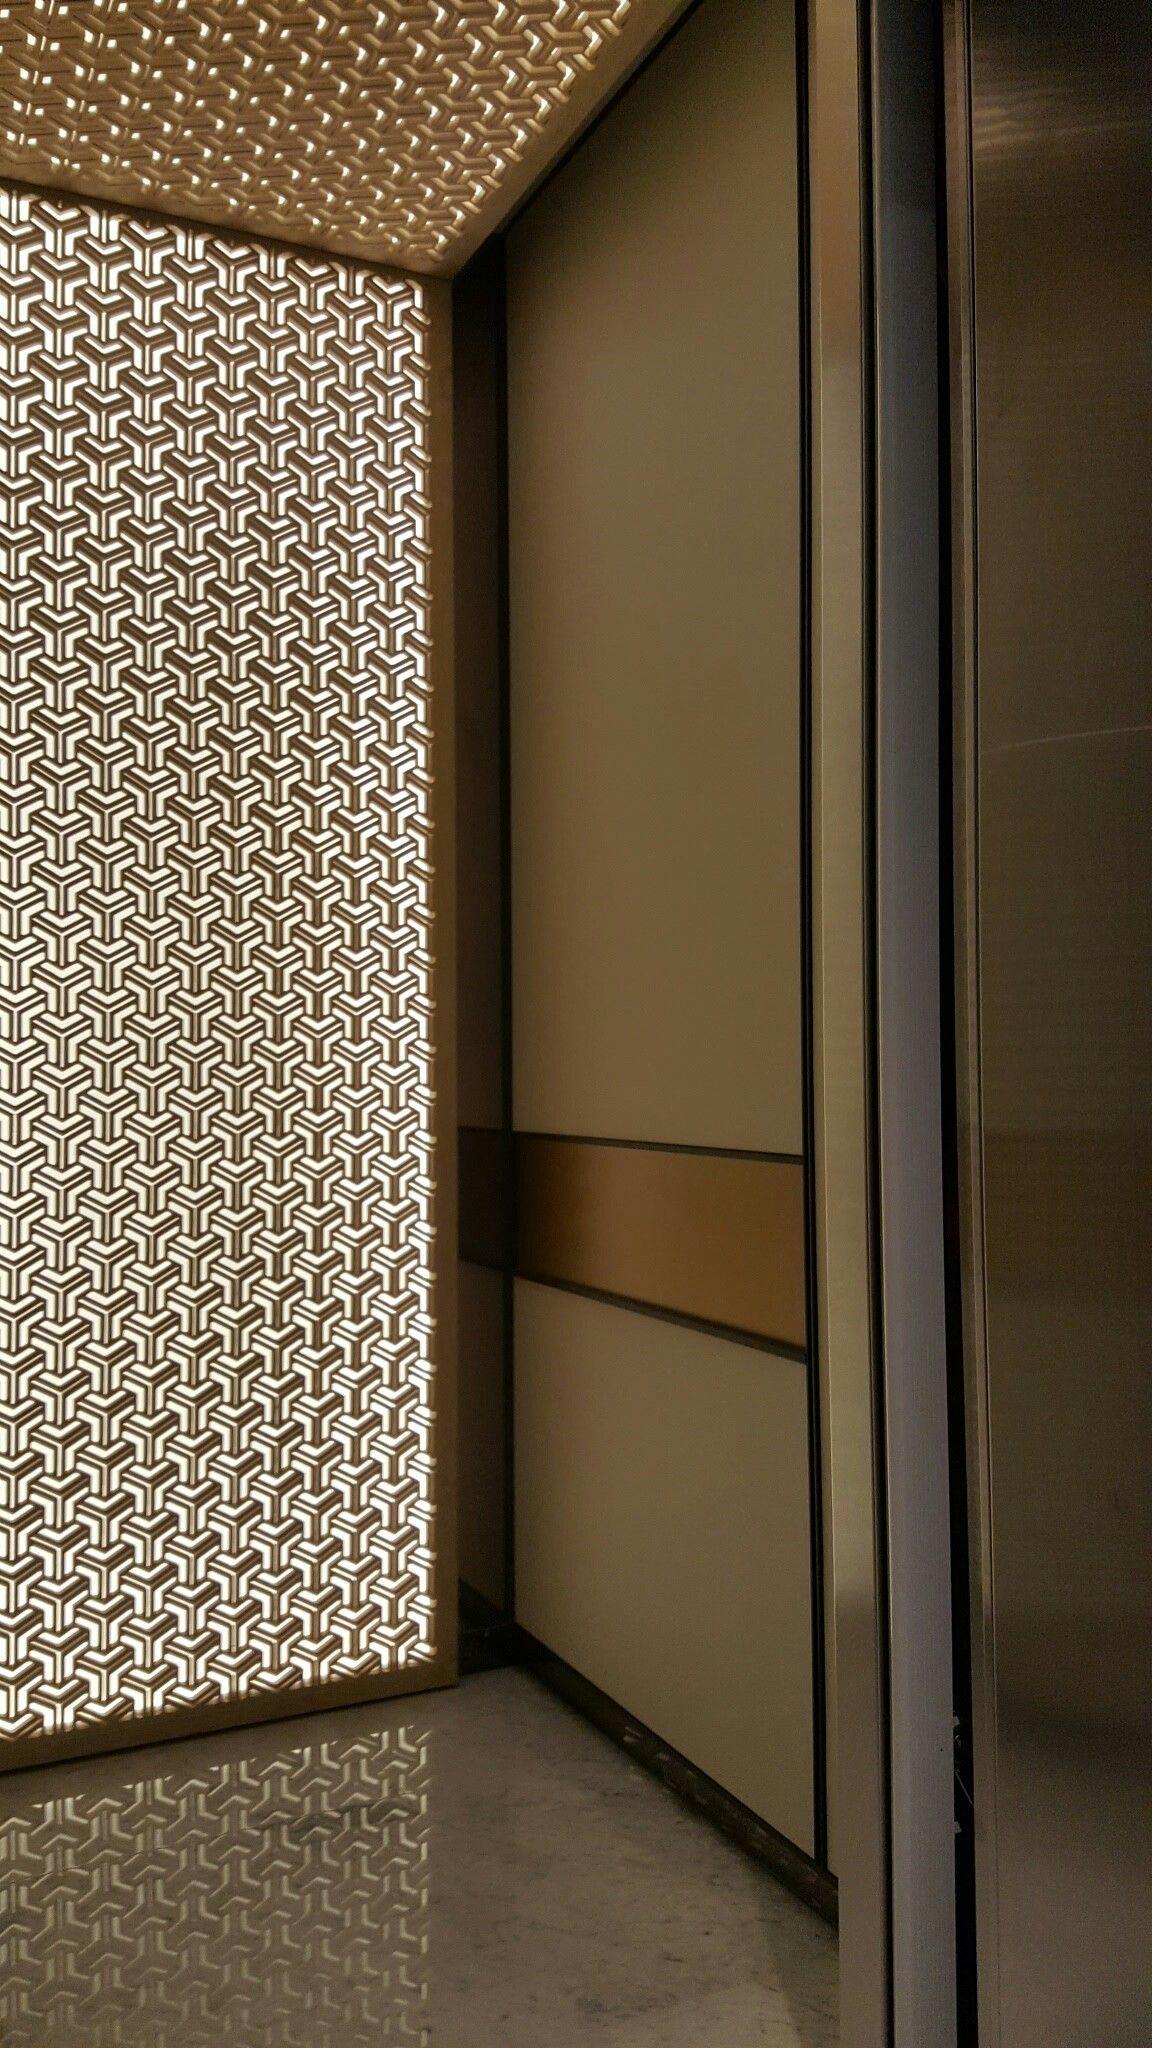 Custom led elevator wall panel with print en 2019 - Florida building code interior walls ...